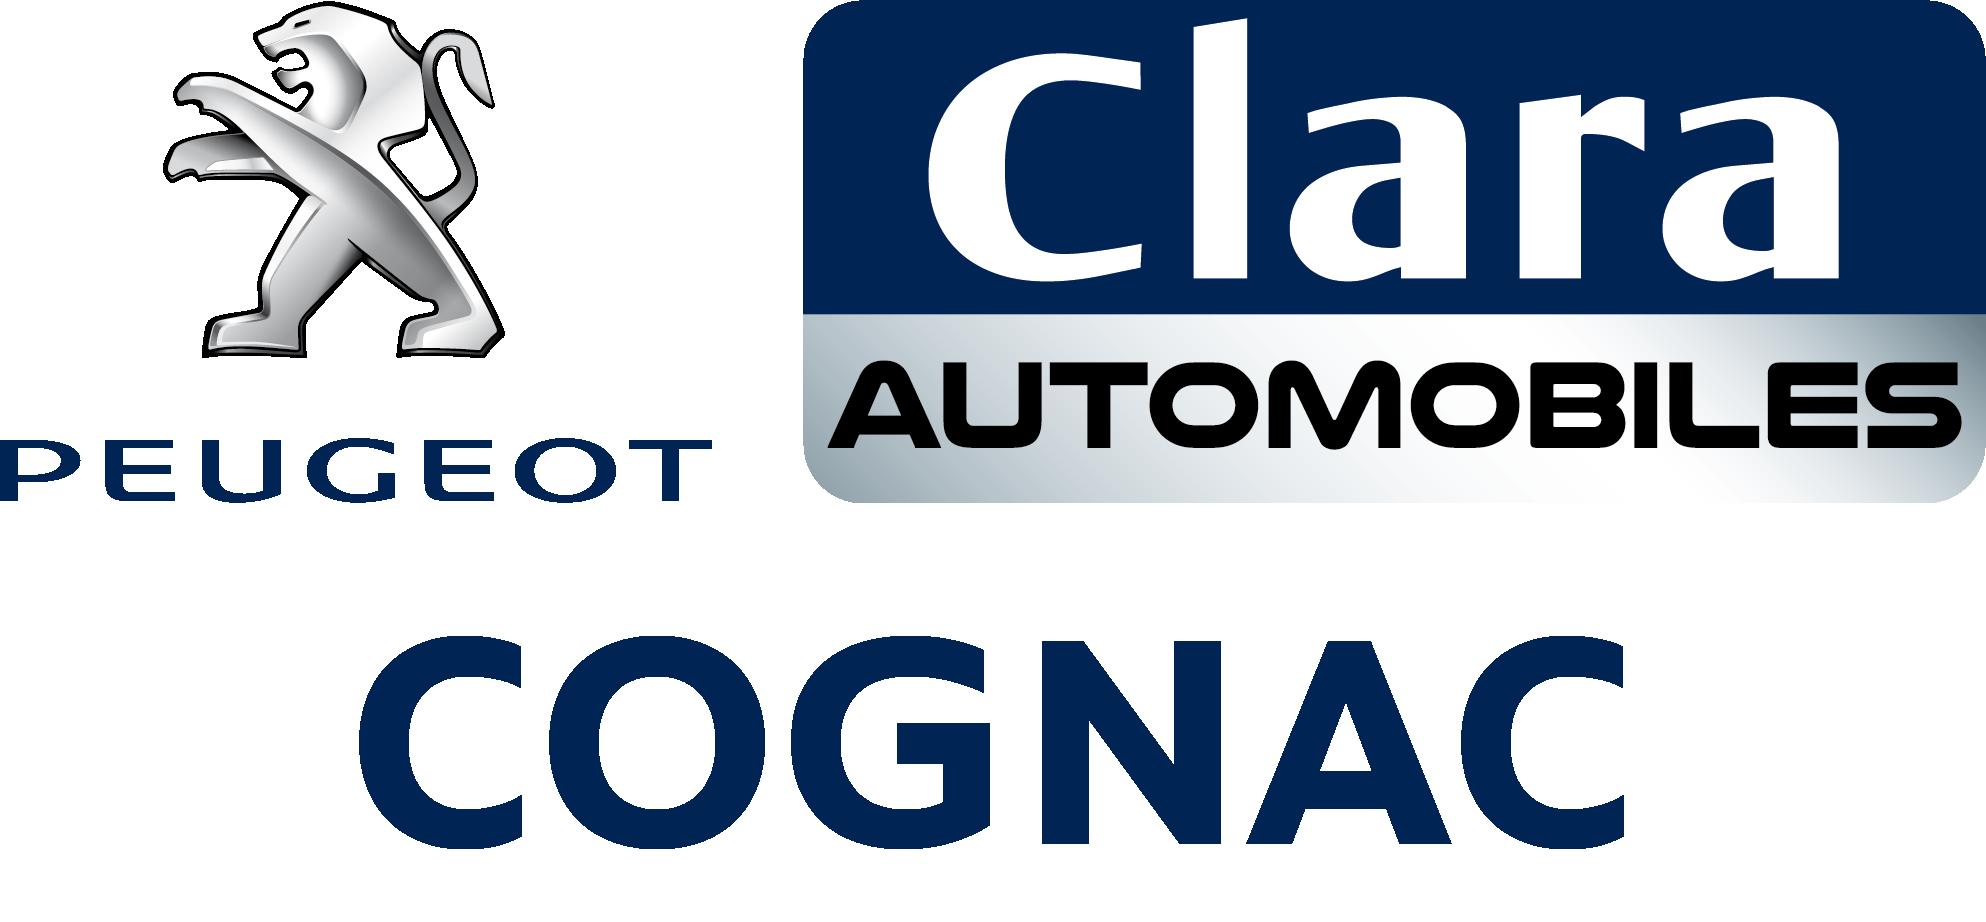 Peugeot Clara Automobiles Cognac